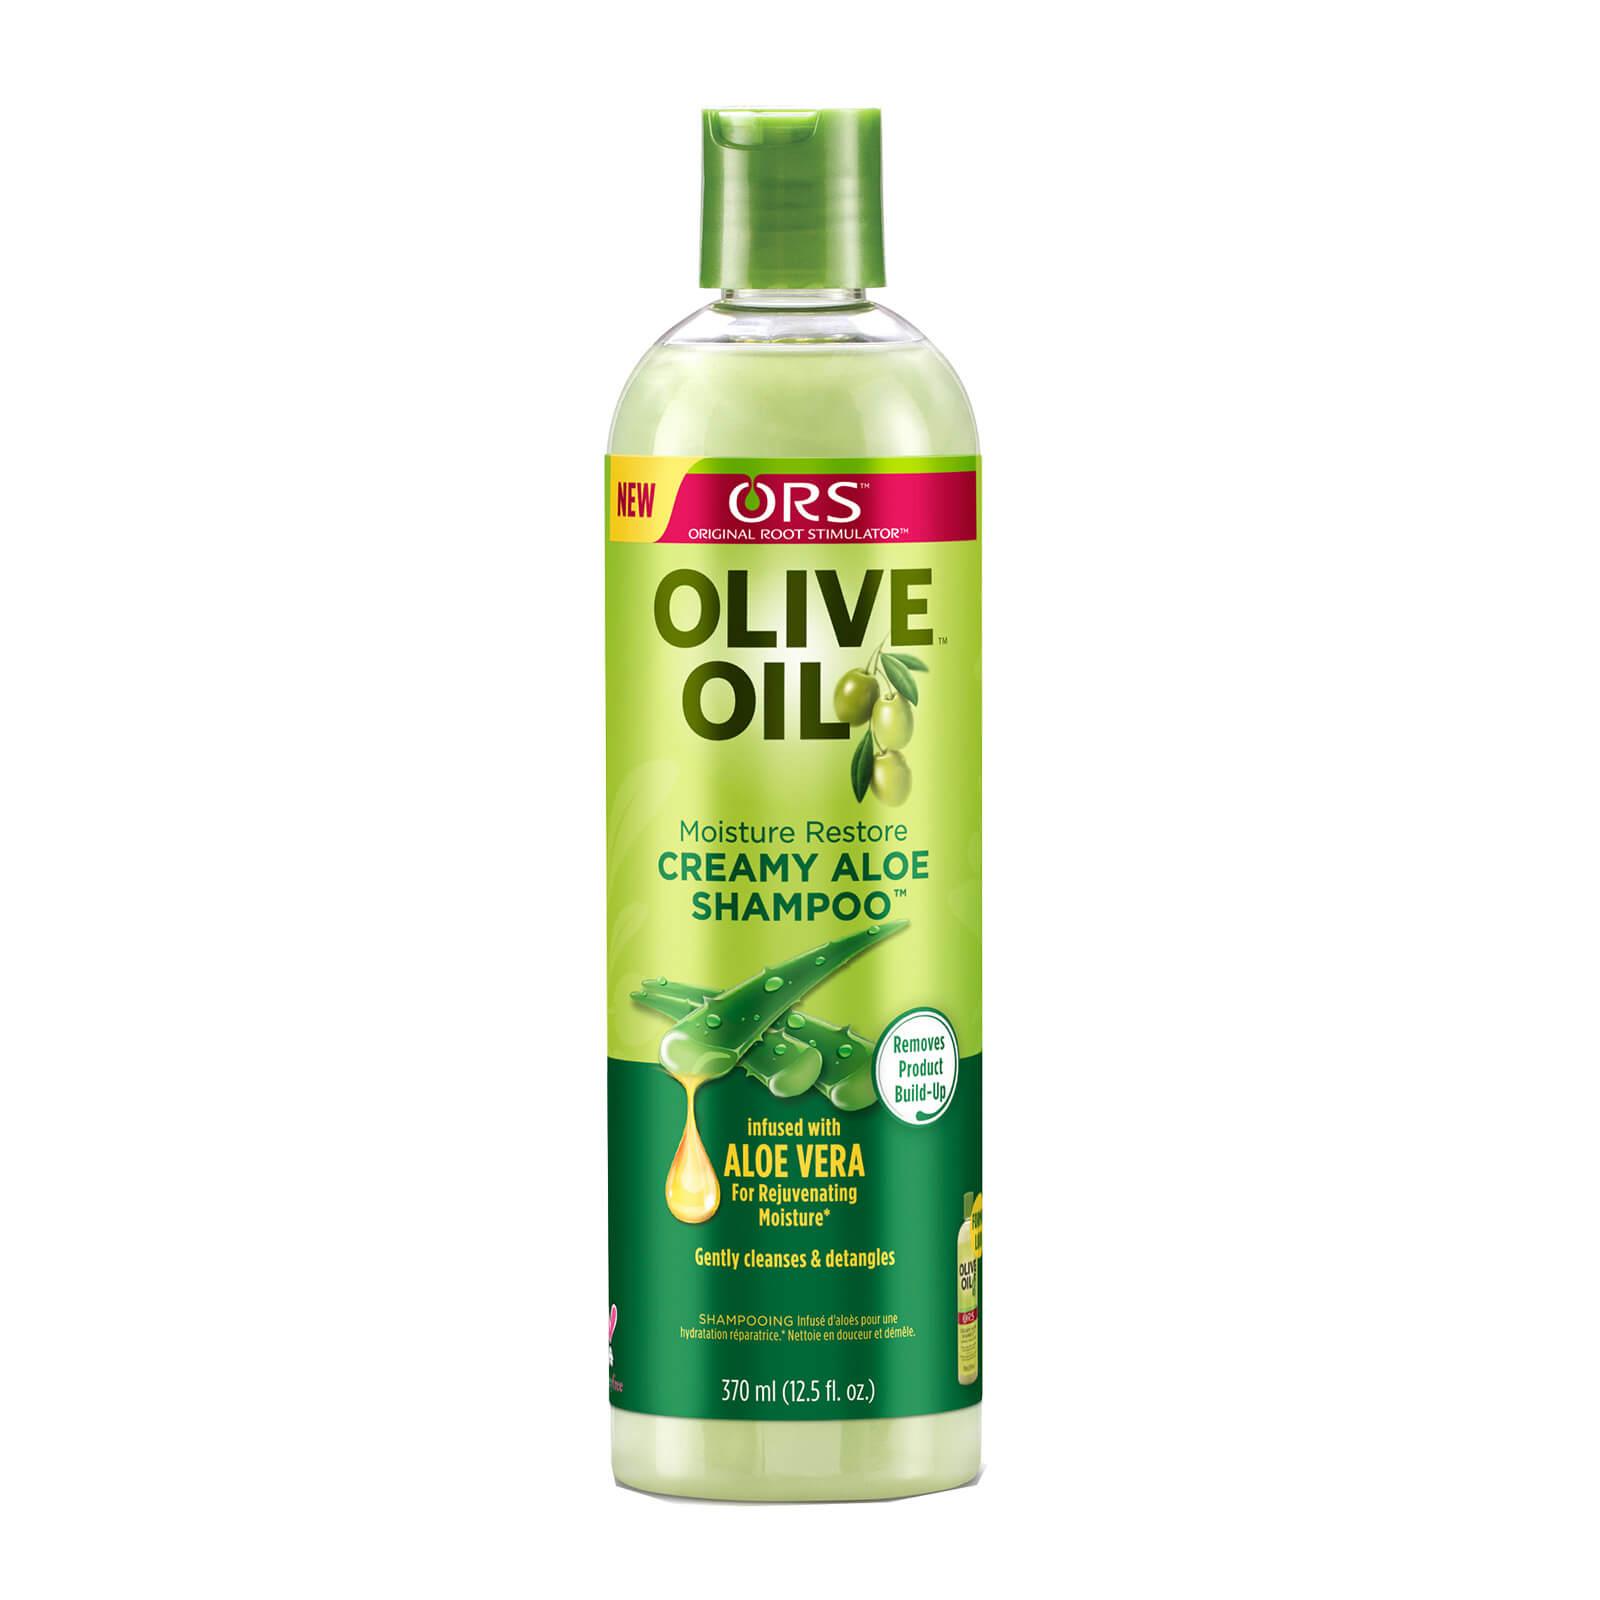 Купить ORS Olive Oil Creamy Aloe Shampoo 370ml